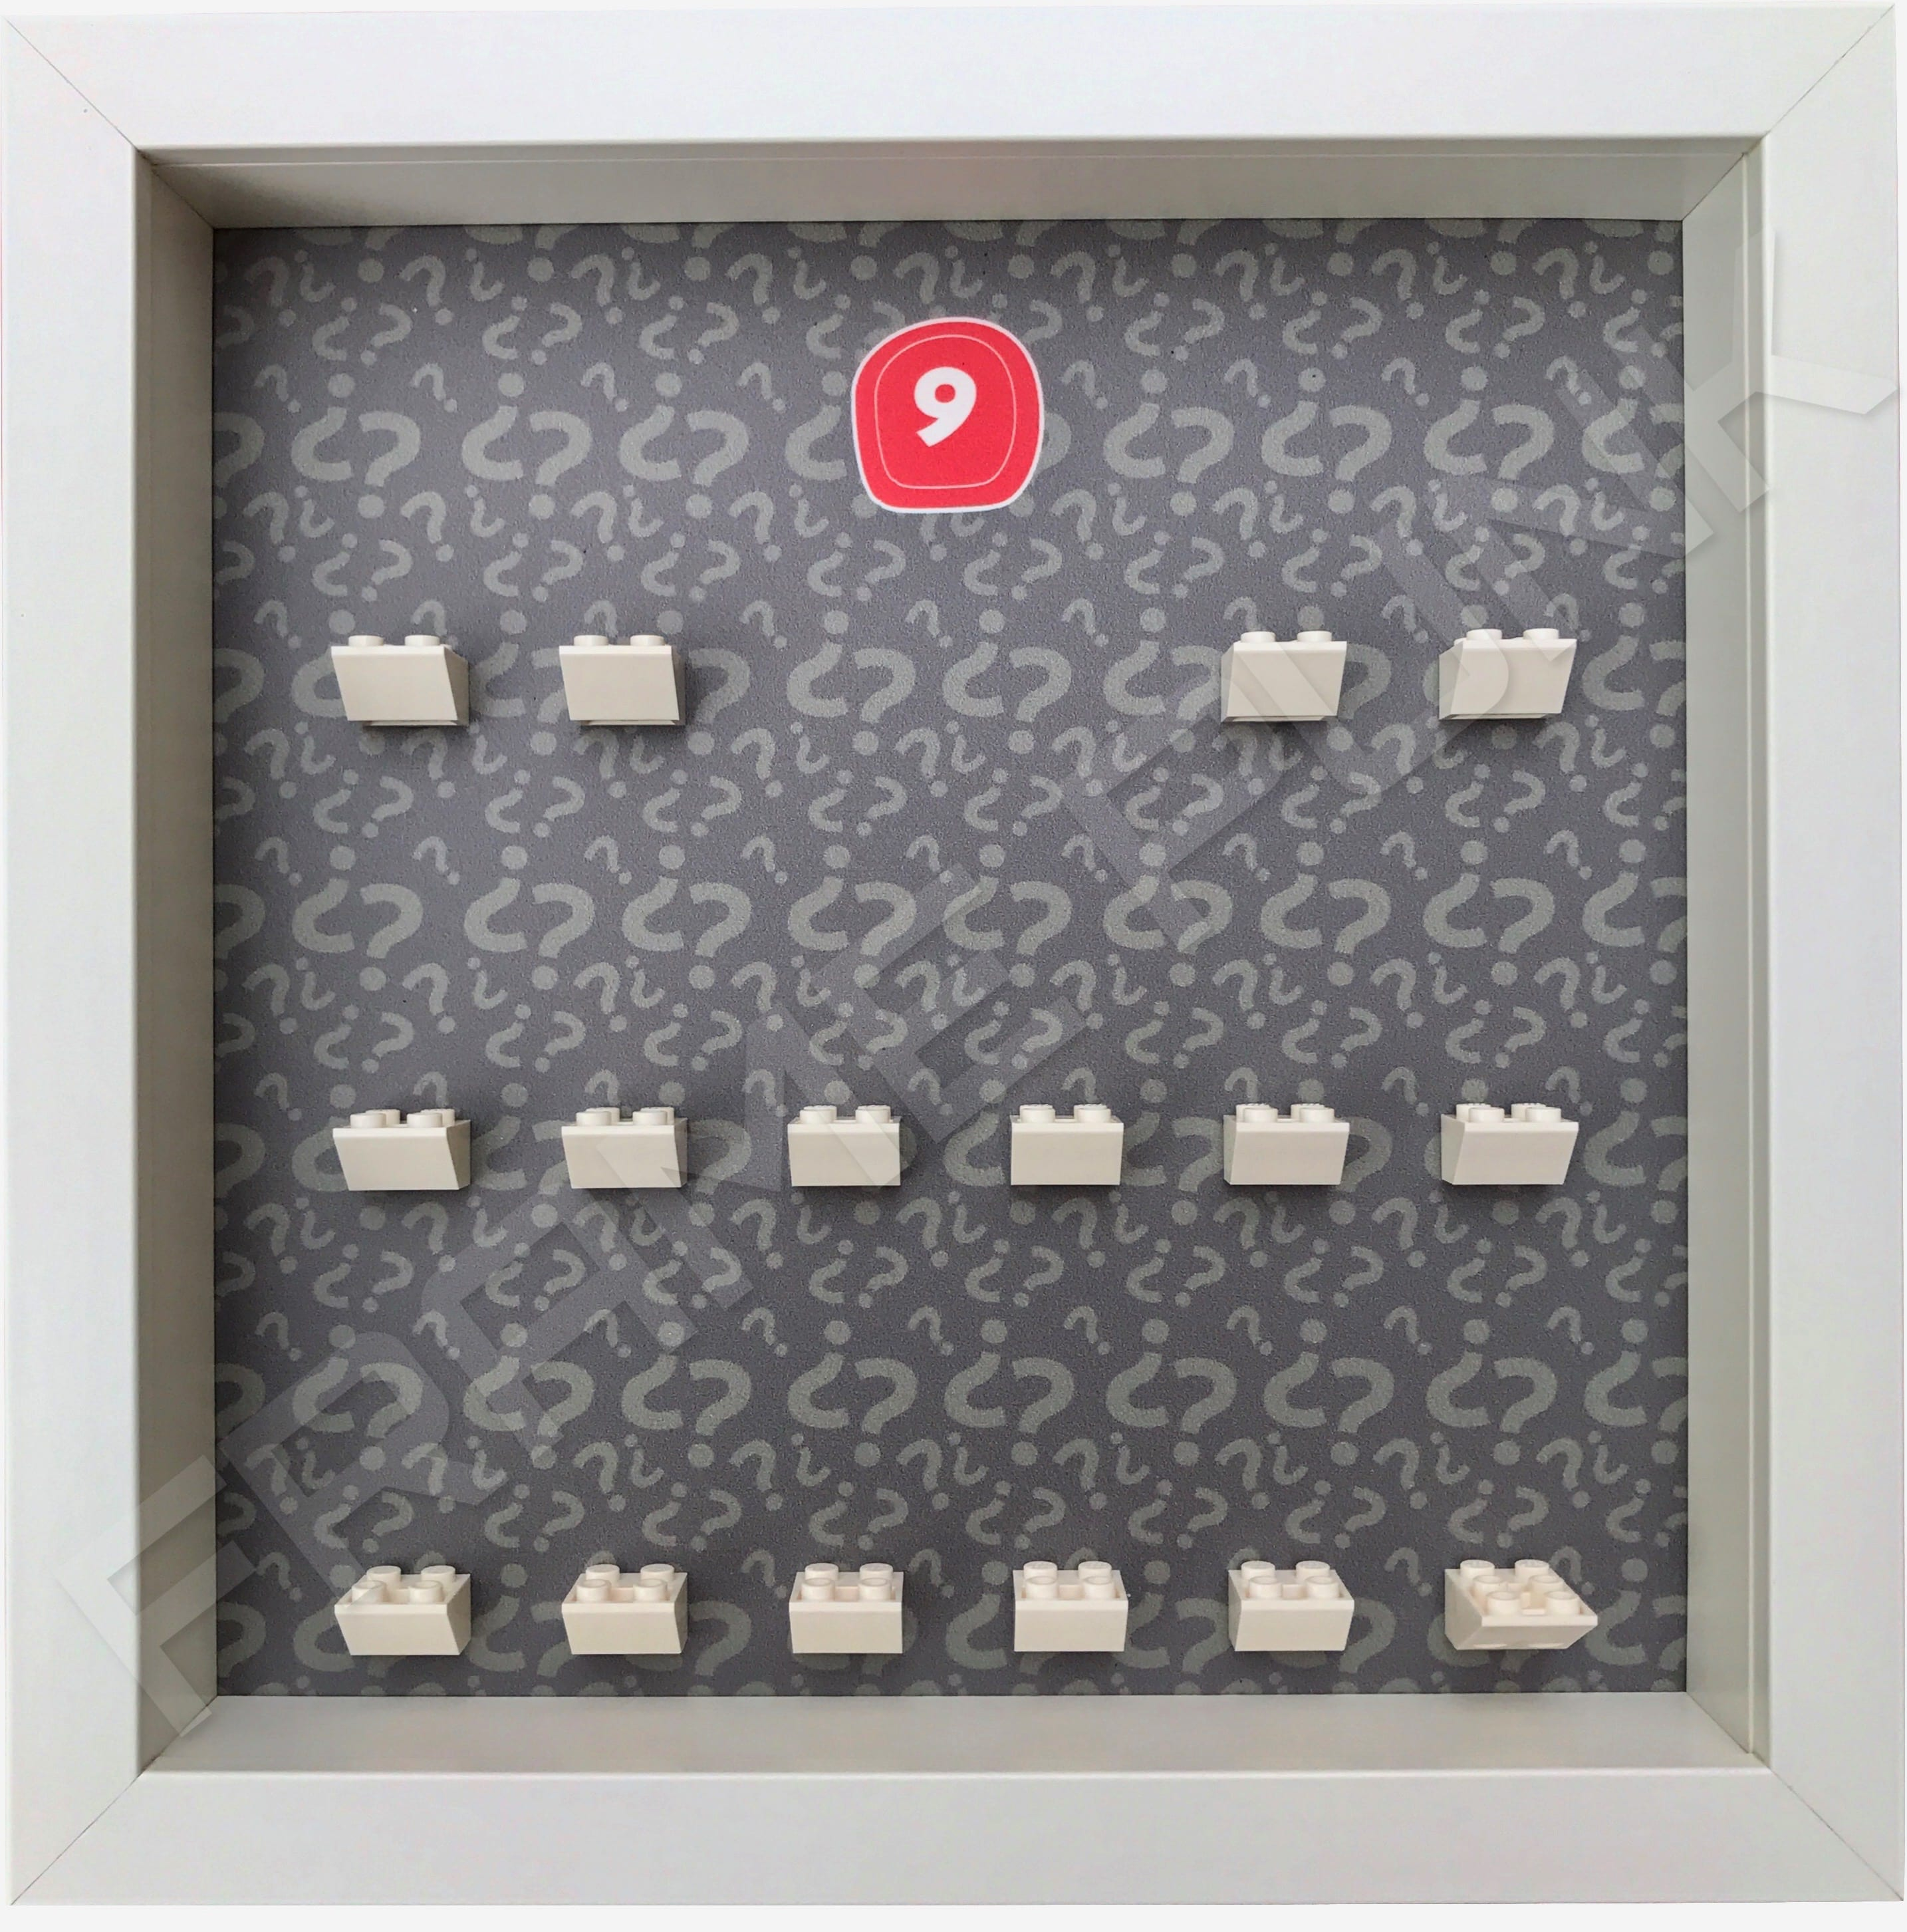 Lego minifigures series 9 display frame